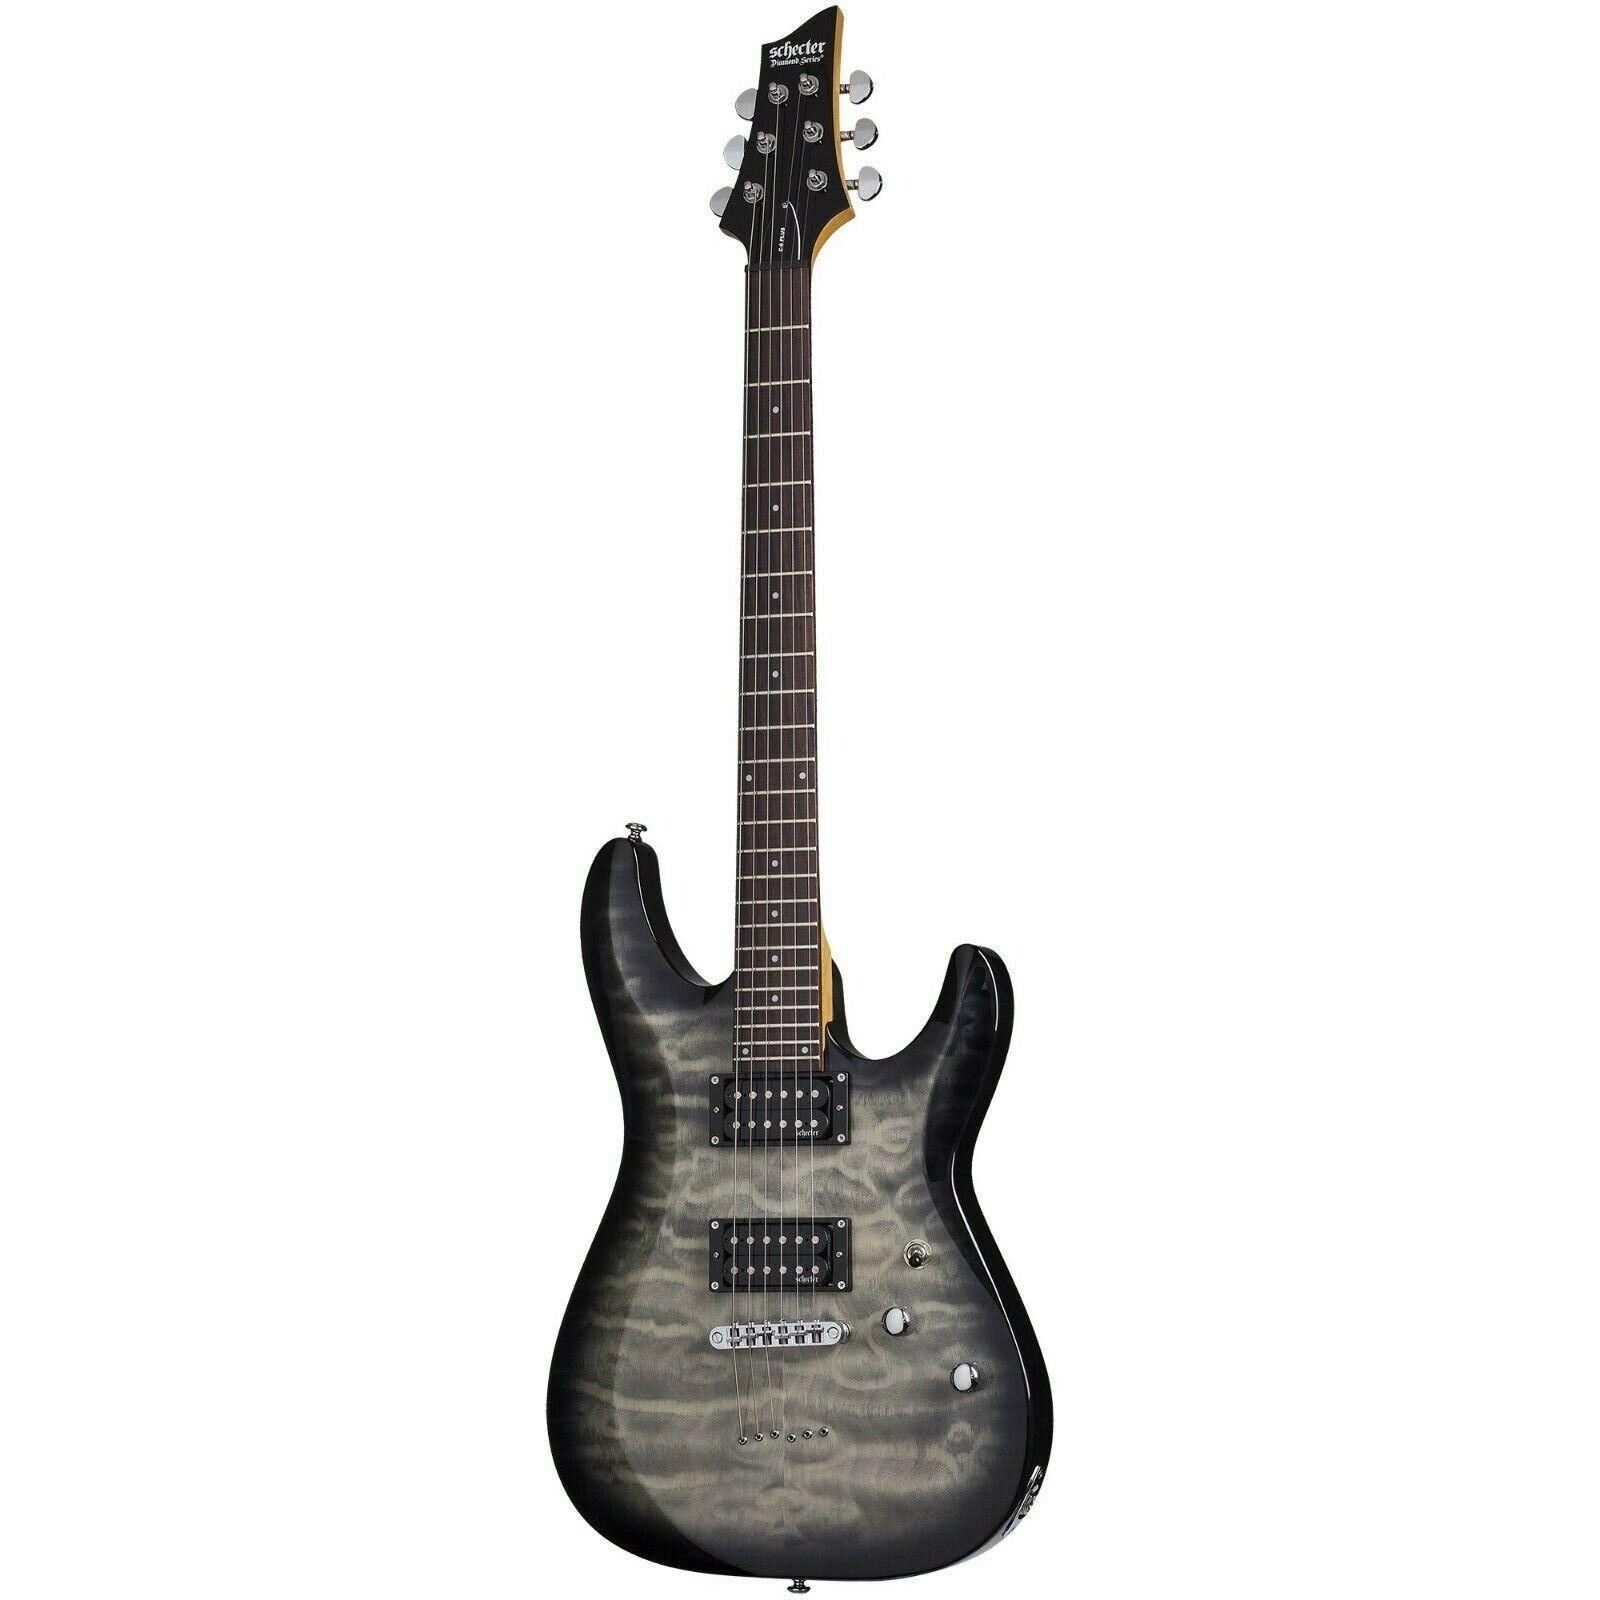 Schecter C-6 Plus Charcoal Burst CB Electric Guitar B-Stock C6 C 6